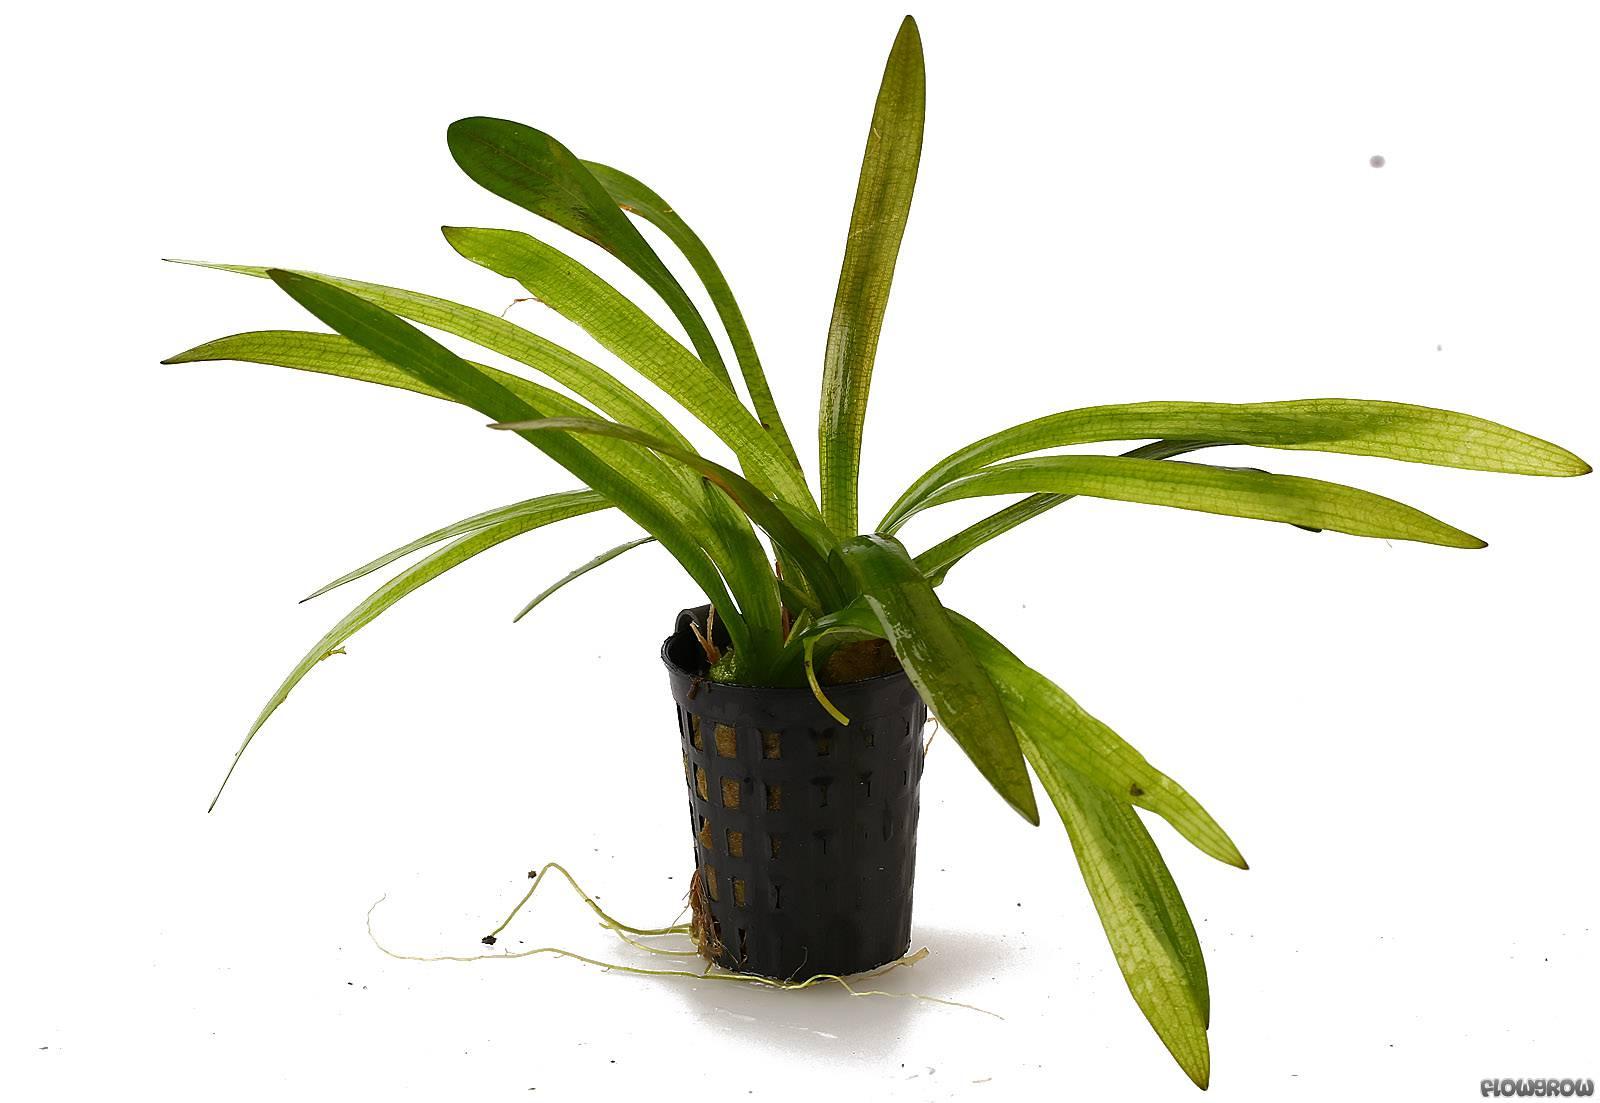 sagittaria-platyphylla-56167fea62402.jpg